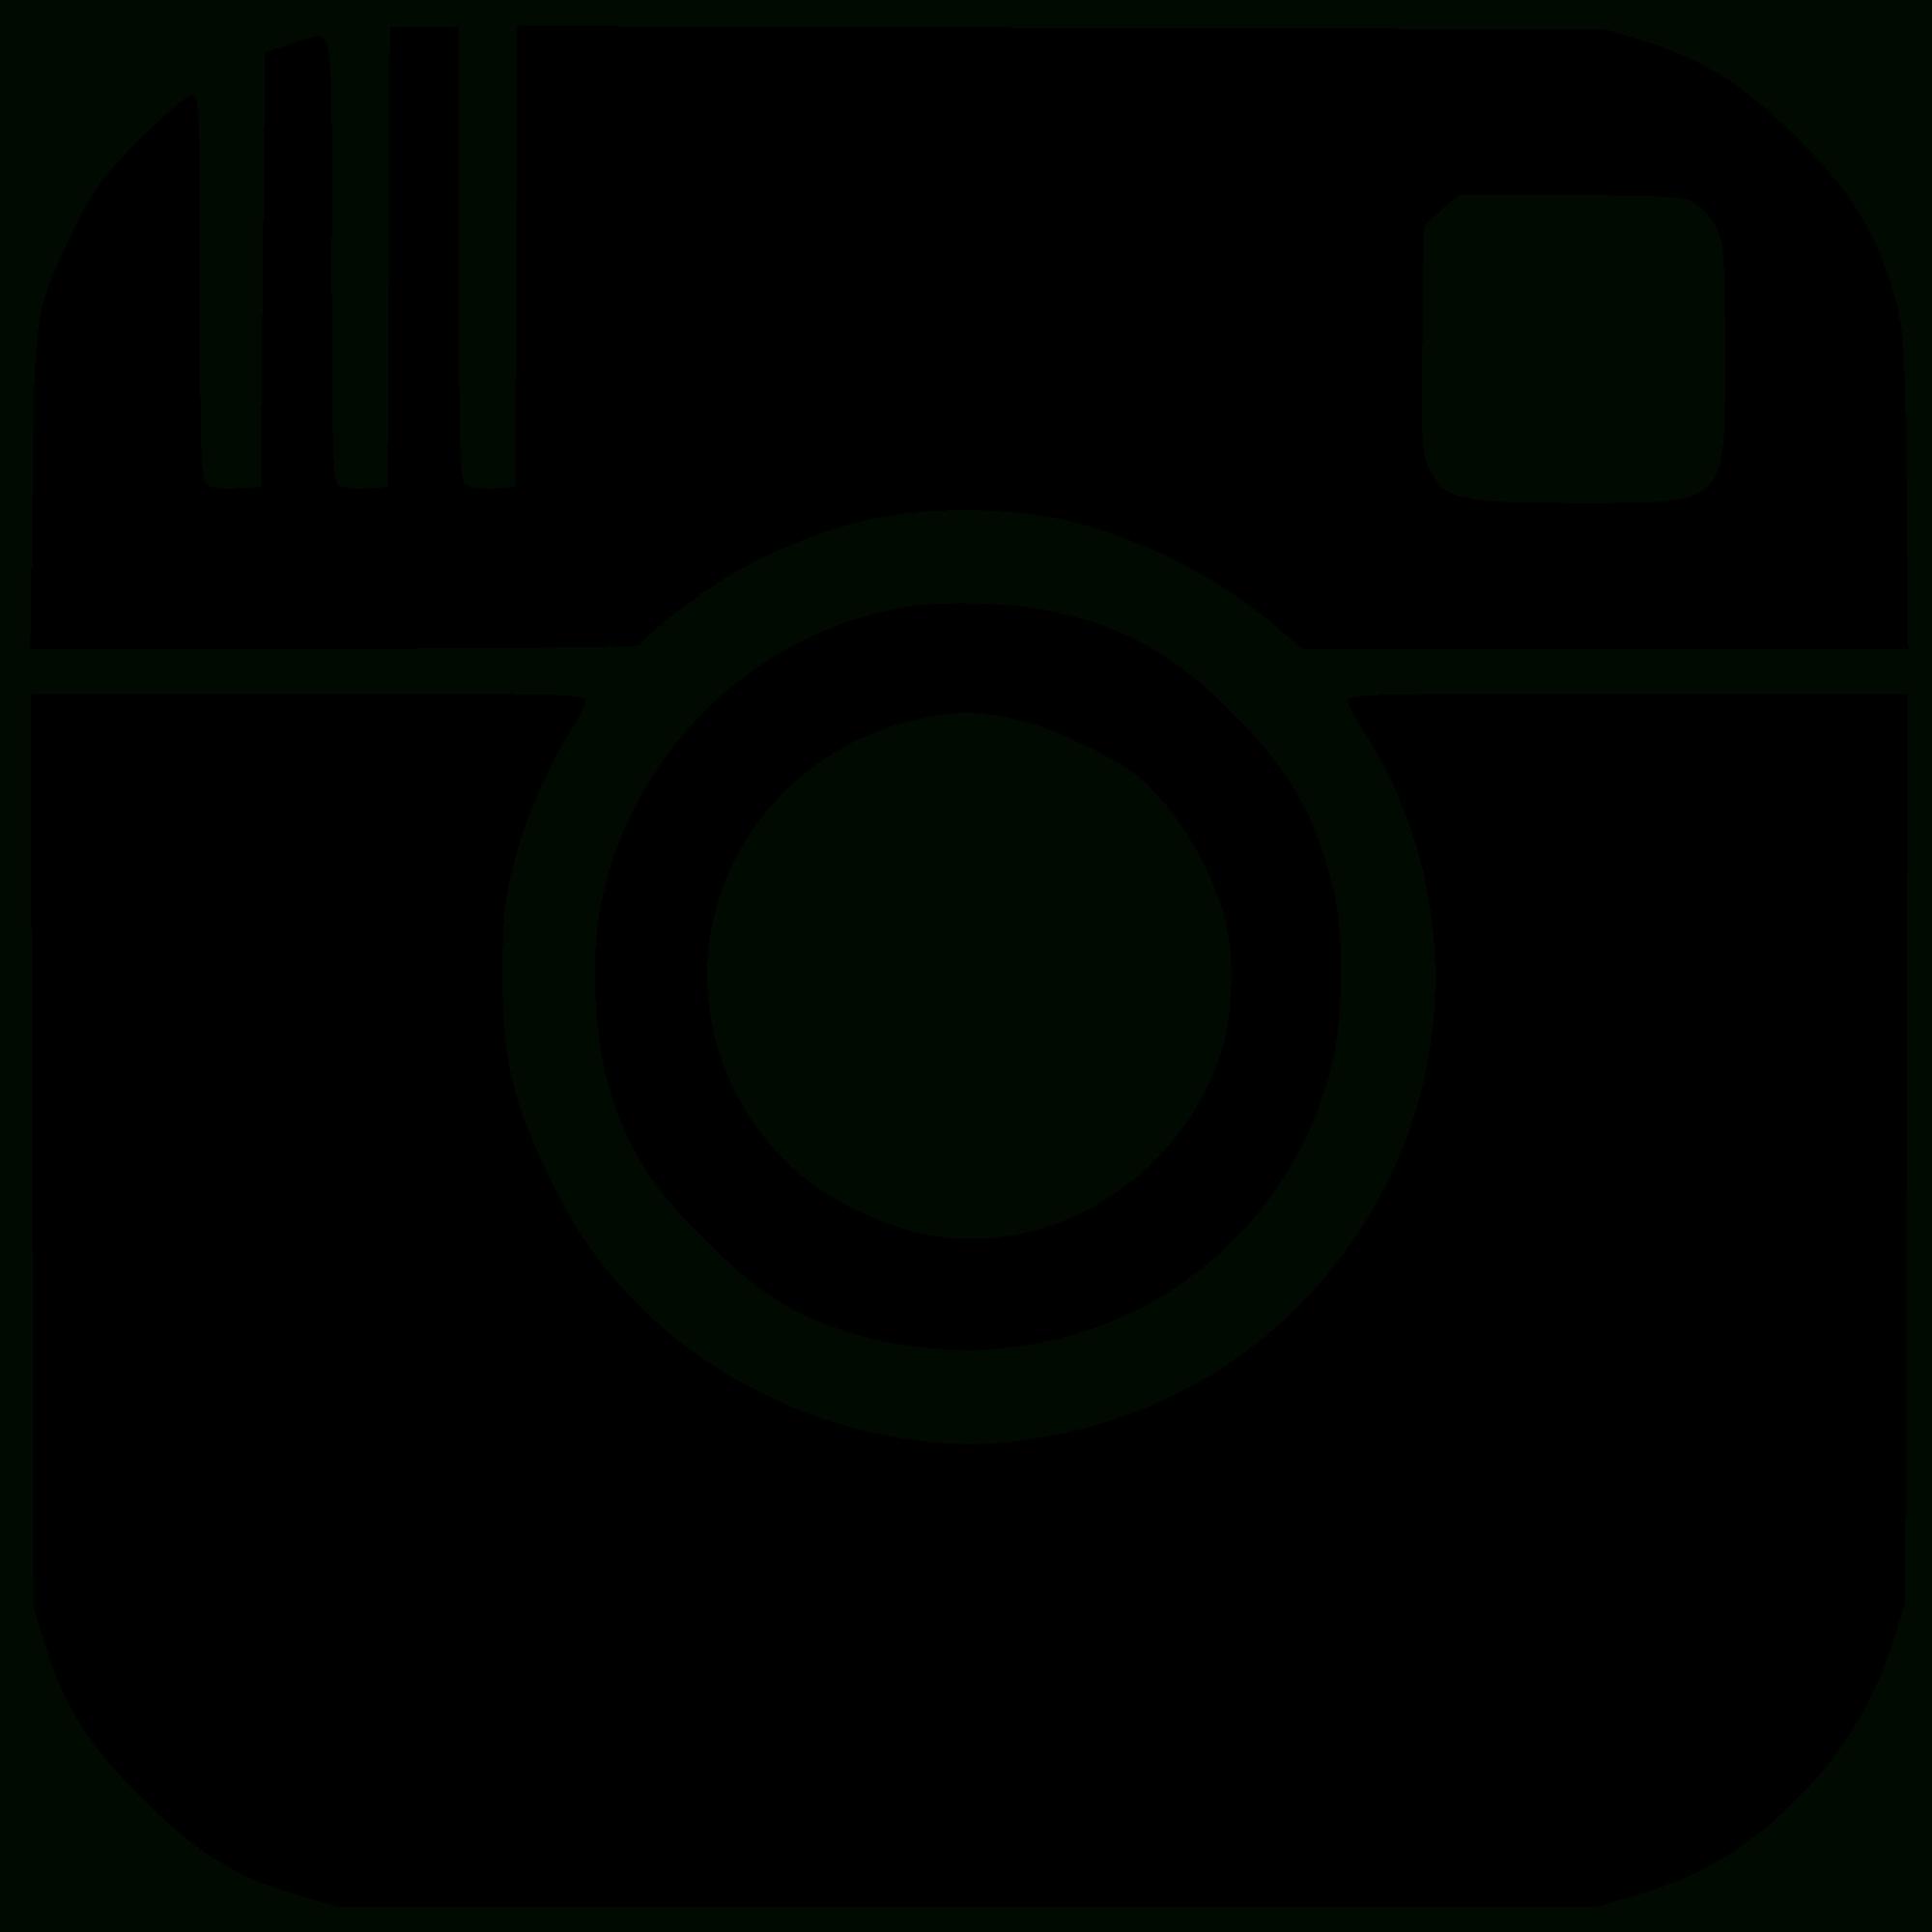 2000x2000 Instagram Logo Black And White Vector Free Design Templates